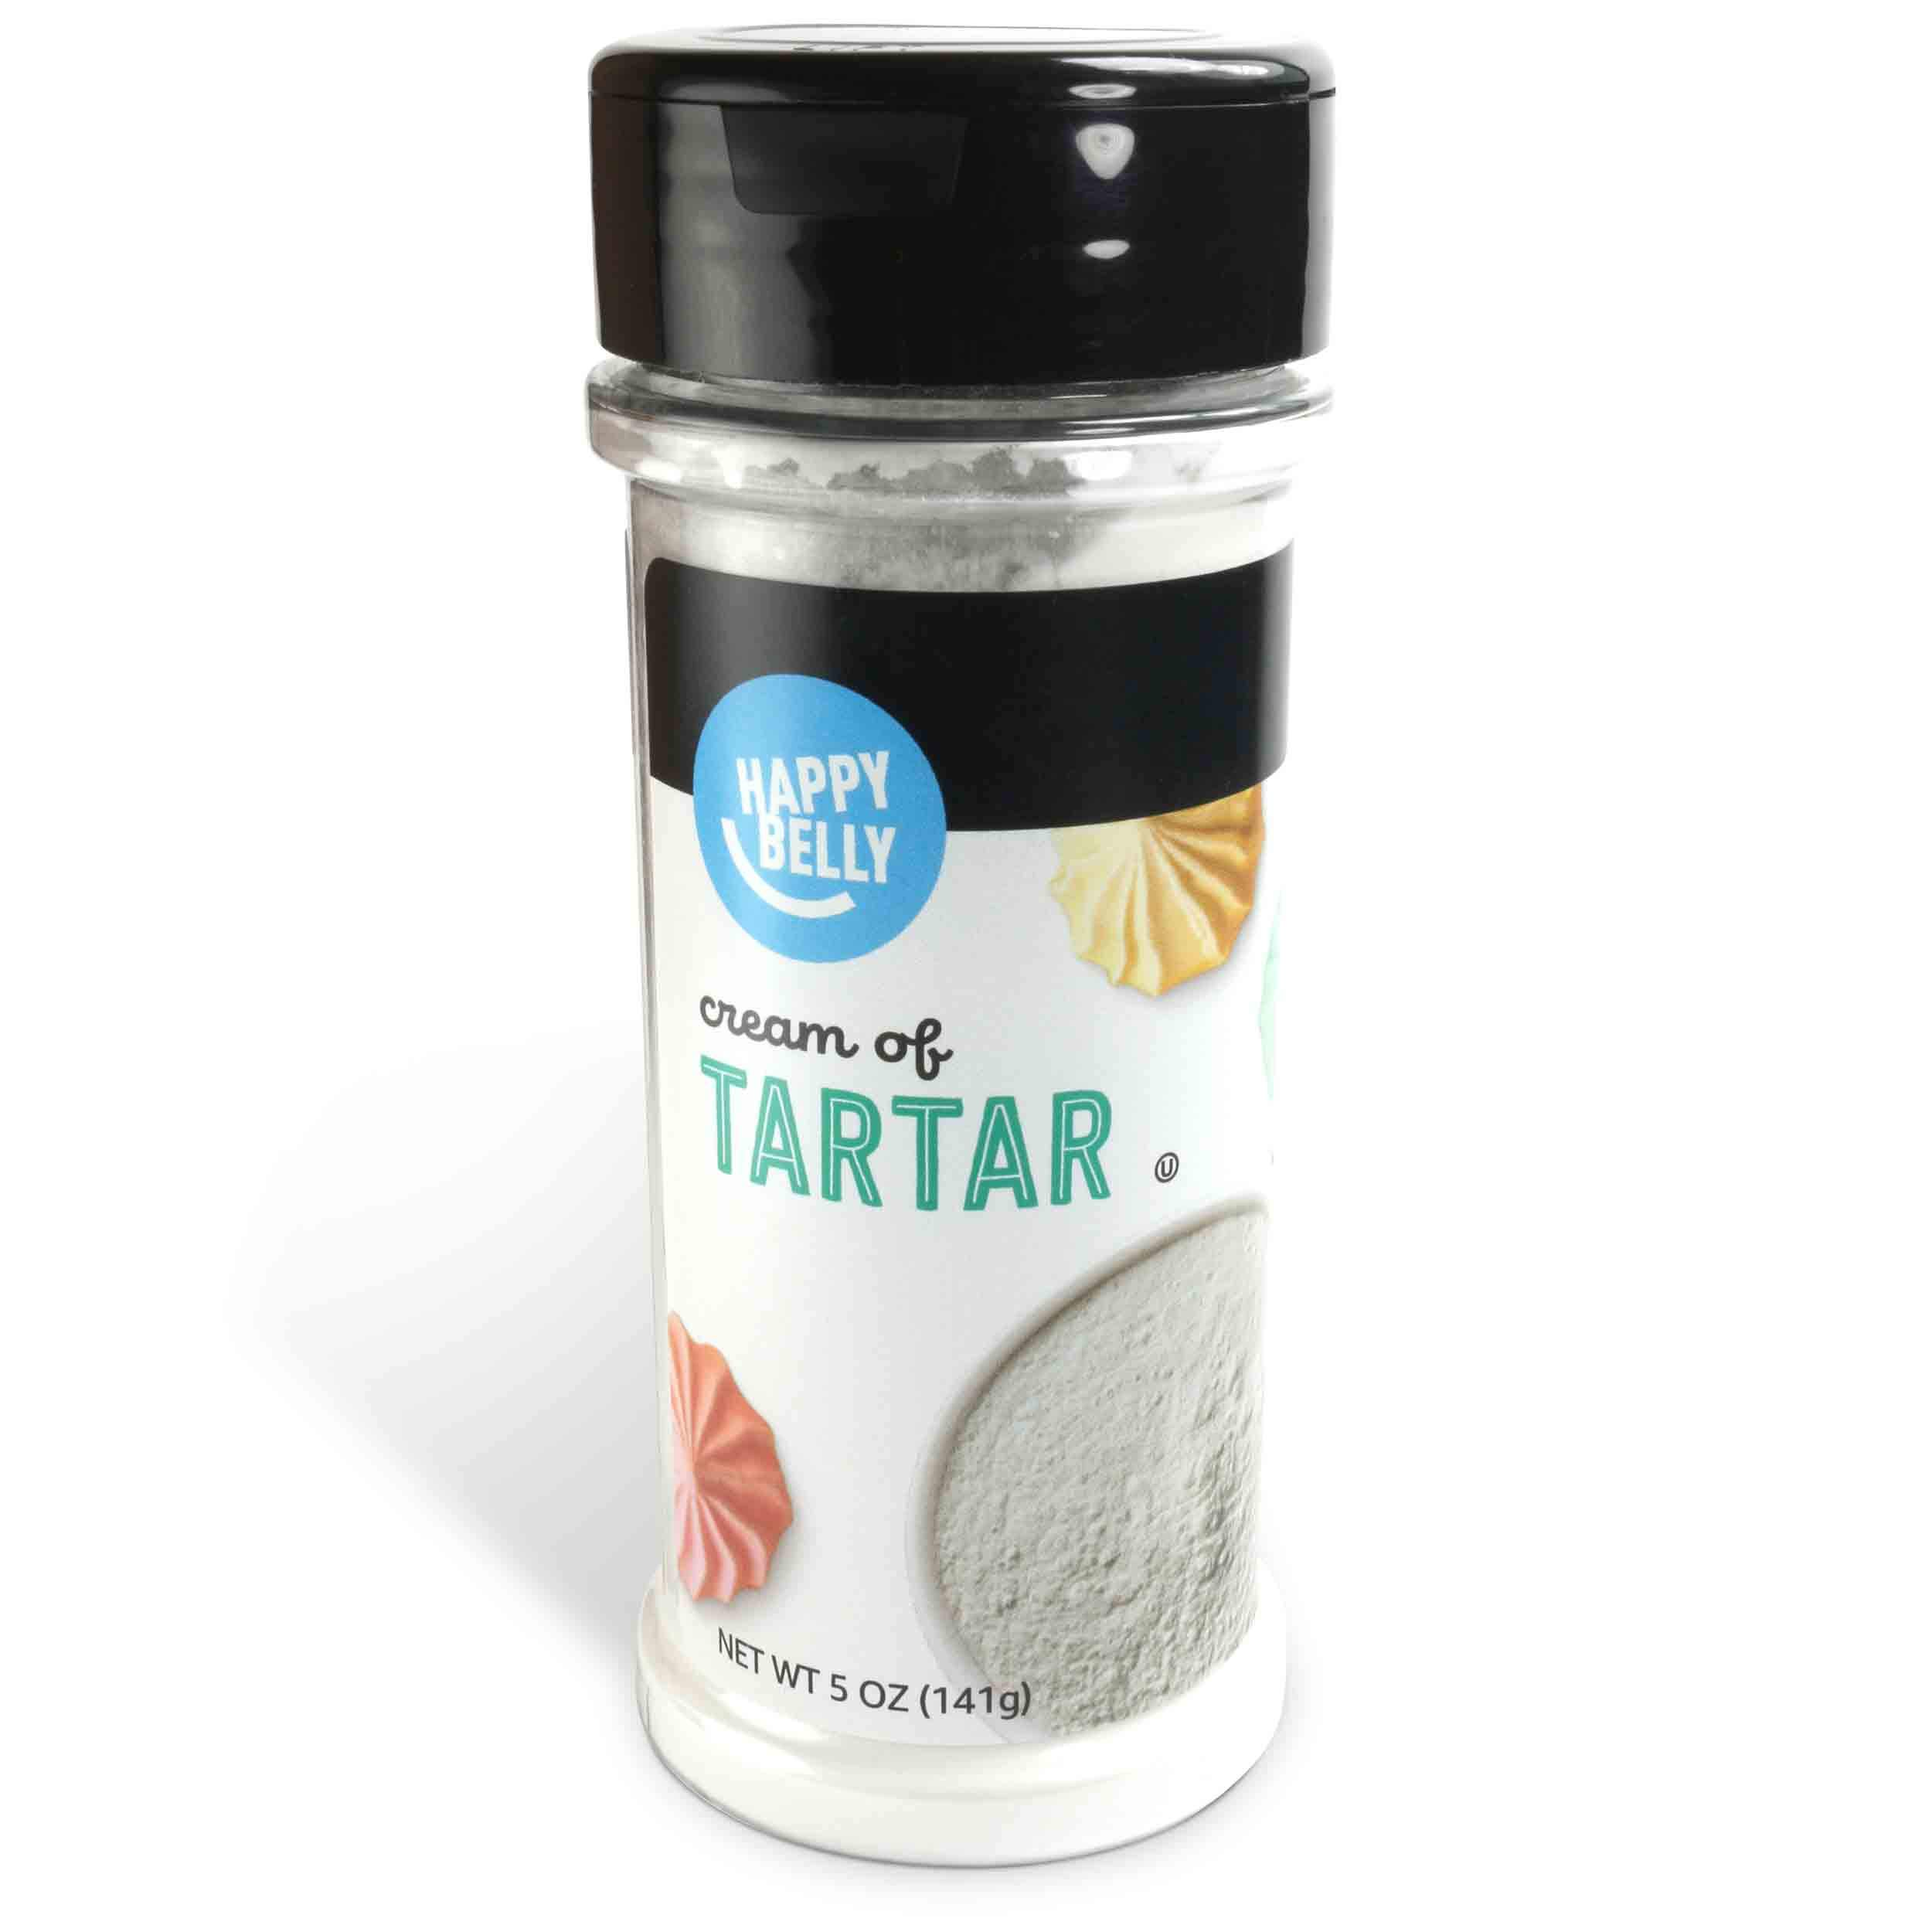 Amazon Brand - Happy Belly Cream of Tartar, 5 Ounces